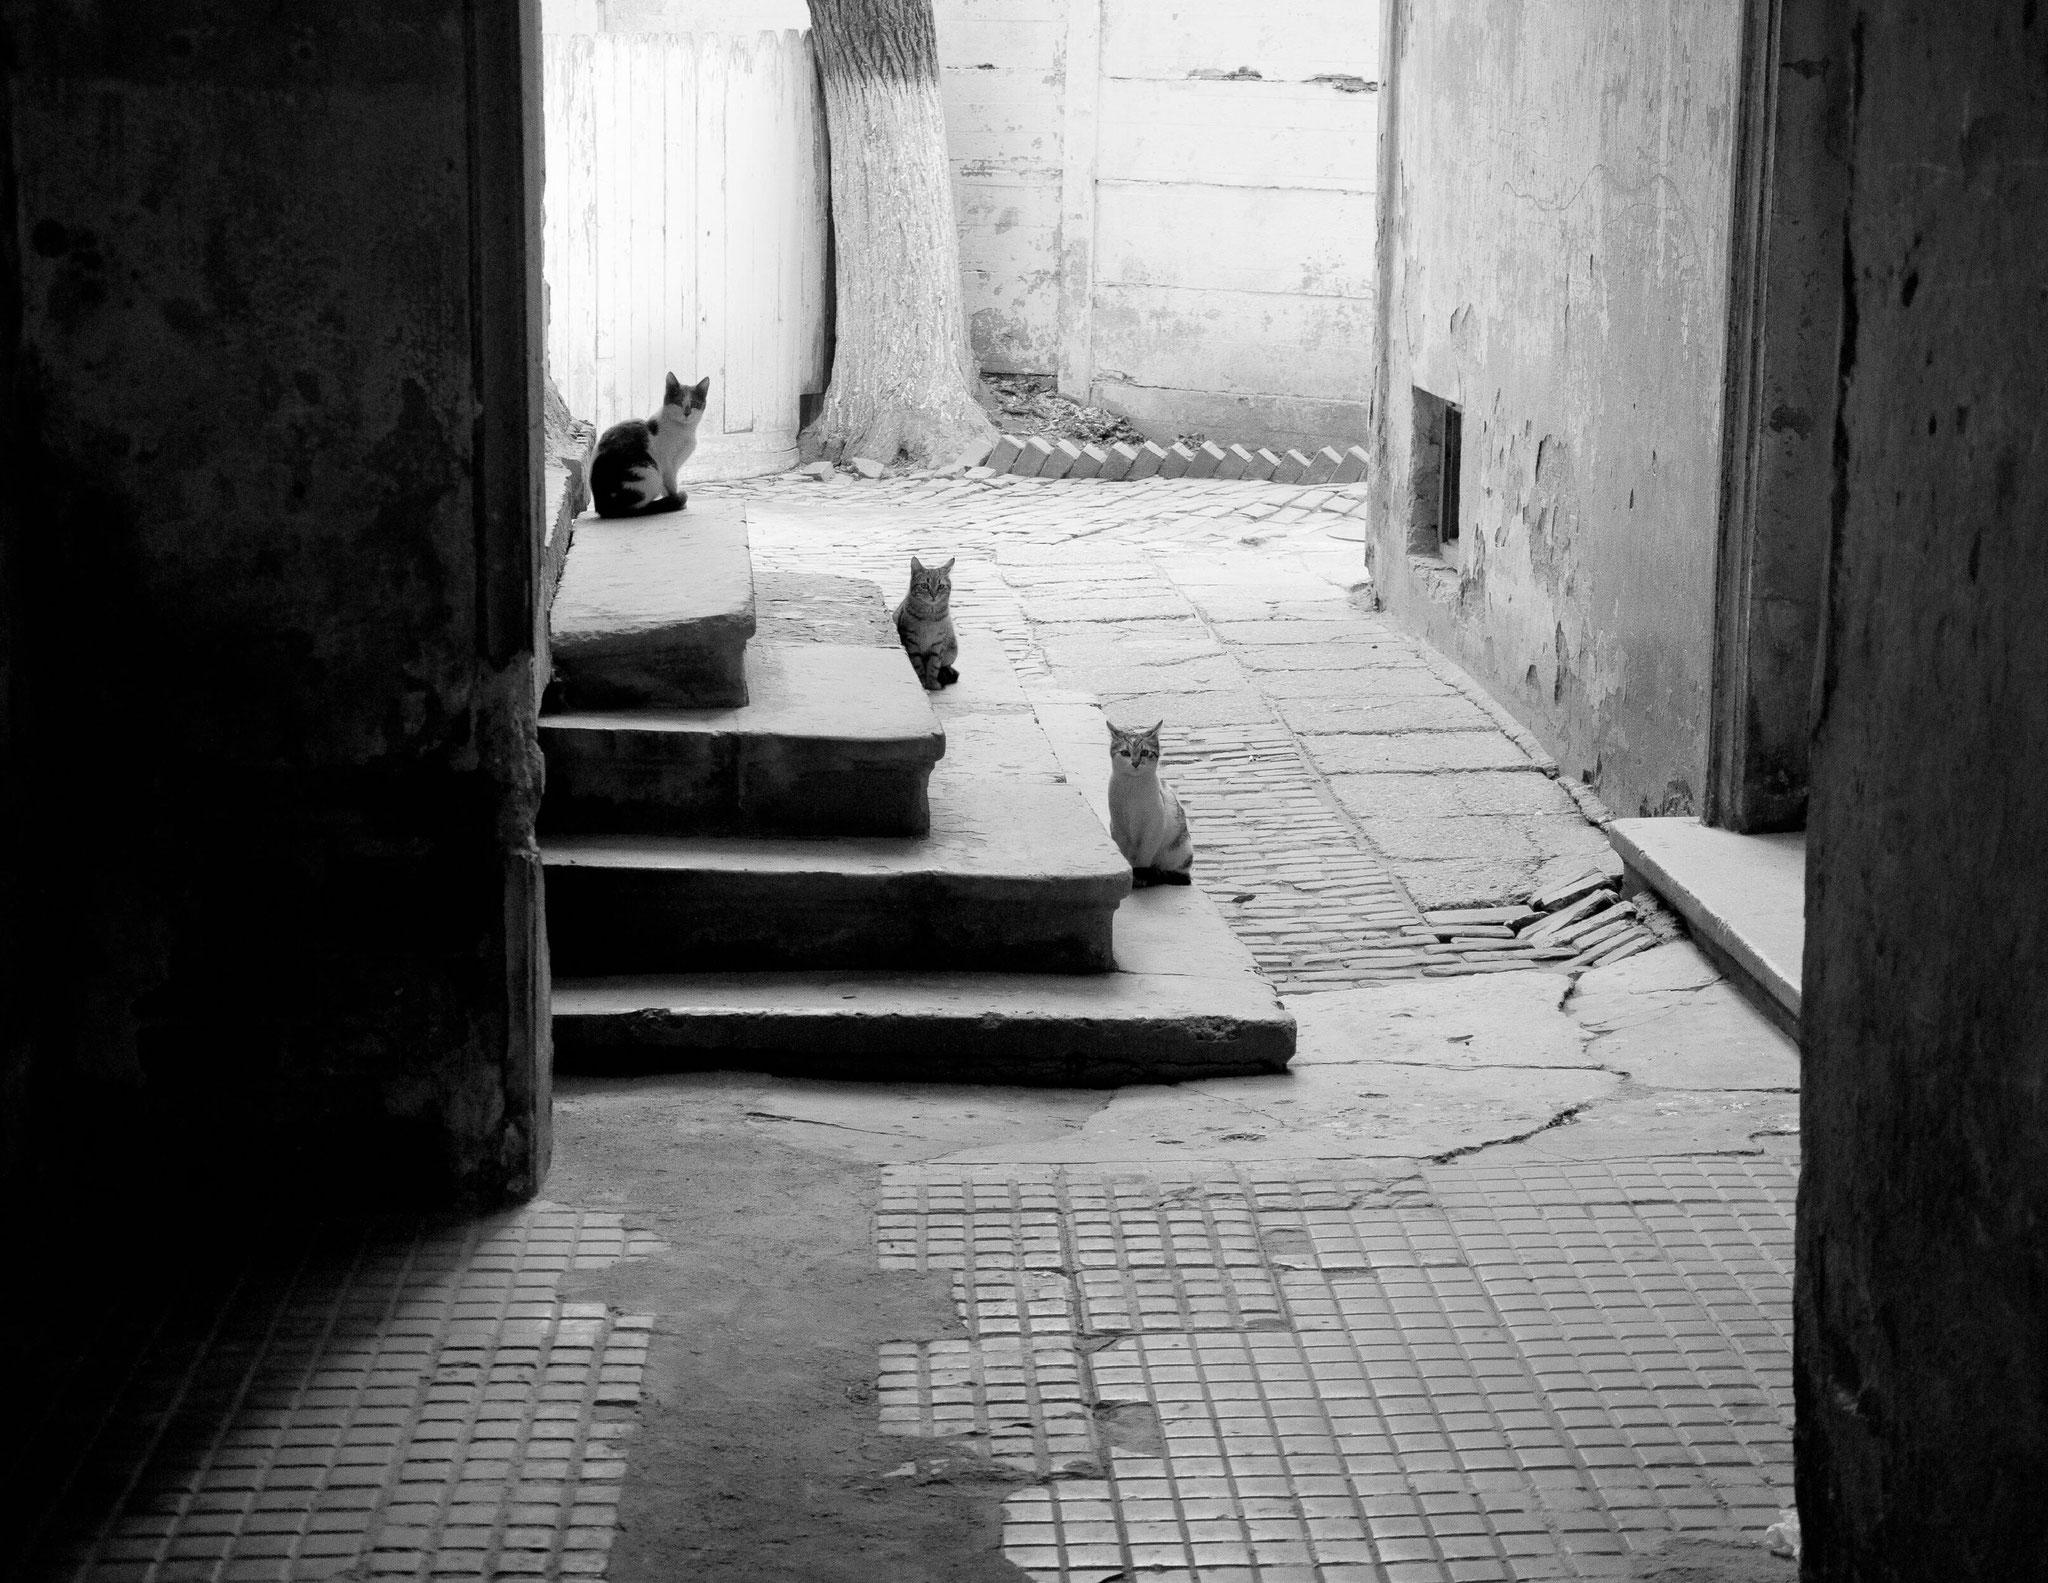 Cornel Hlupina (Romania) - Waiting